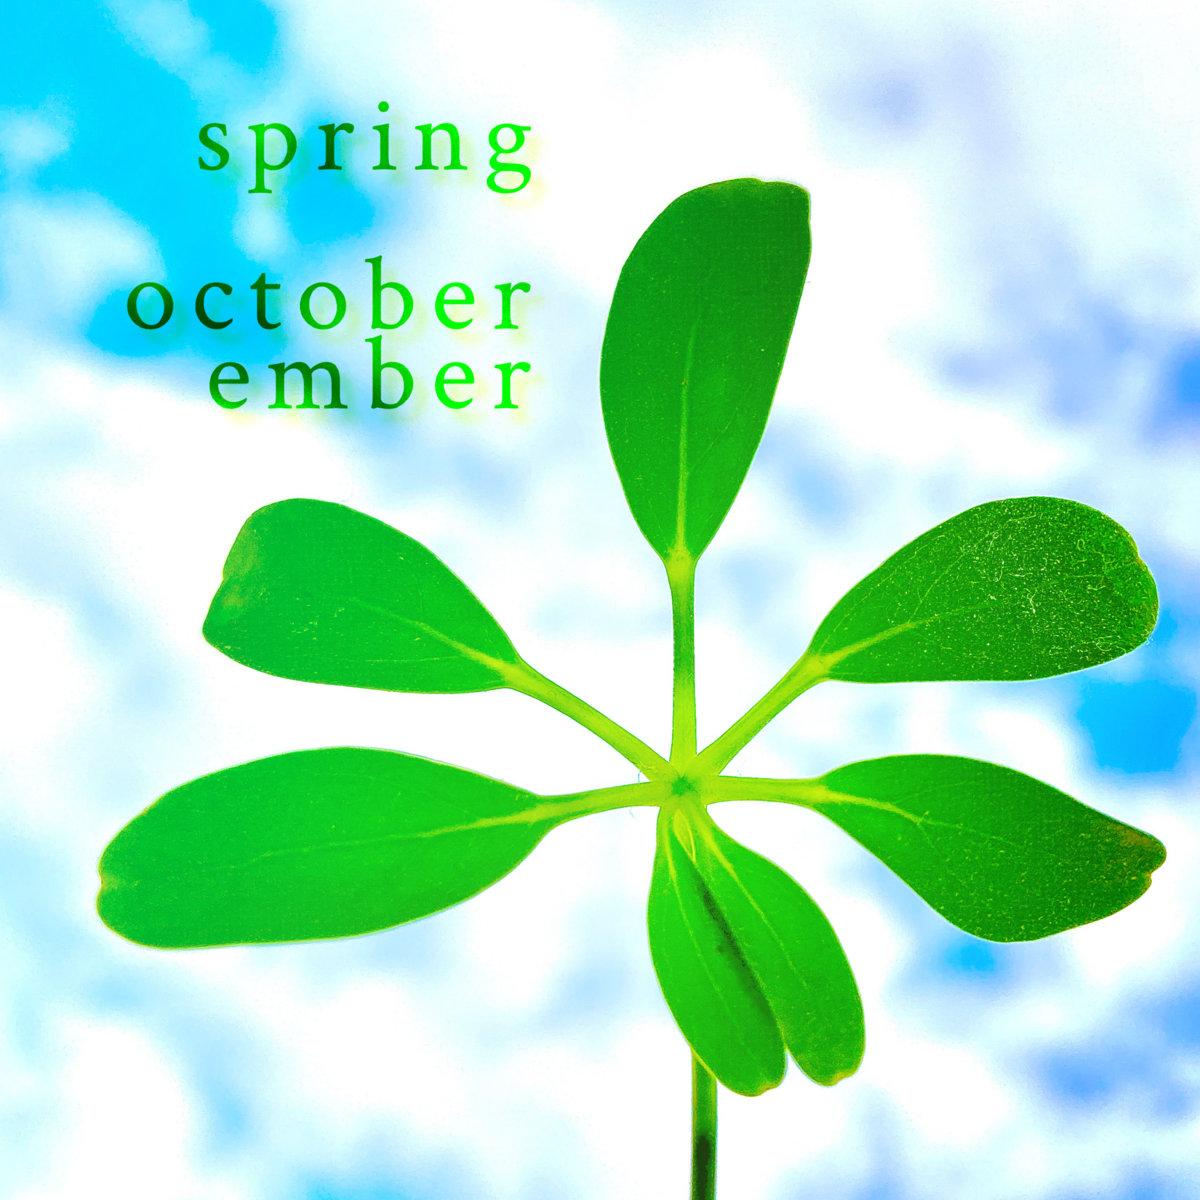 Spring by October Ember